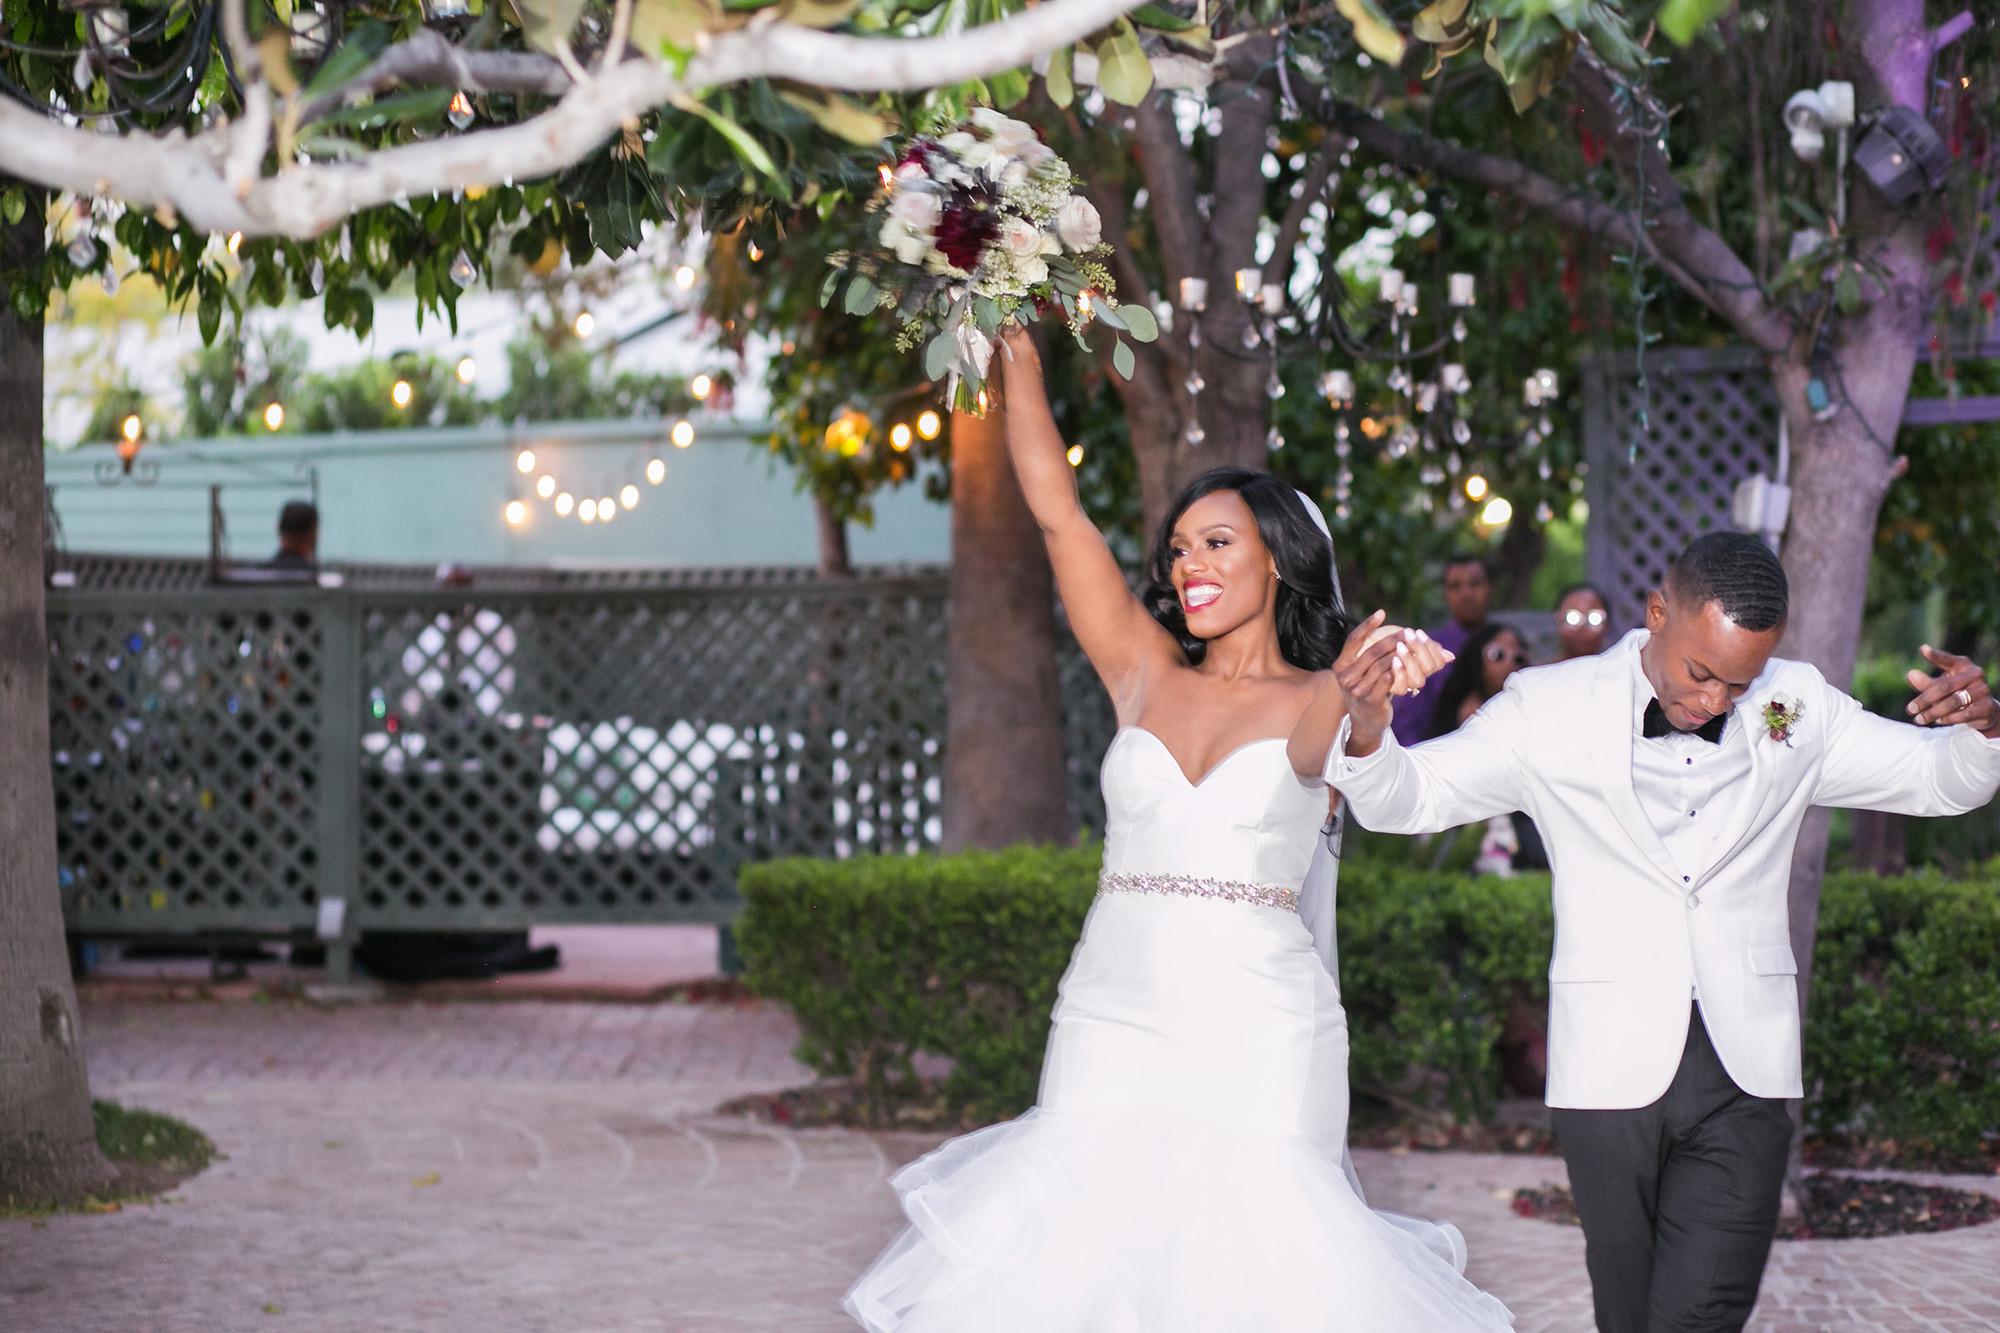 associate-photographer-christmas-house-wedding-carrie-vines-0120.jpg